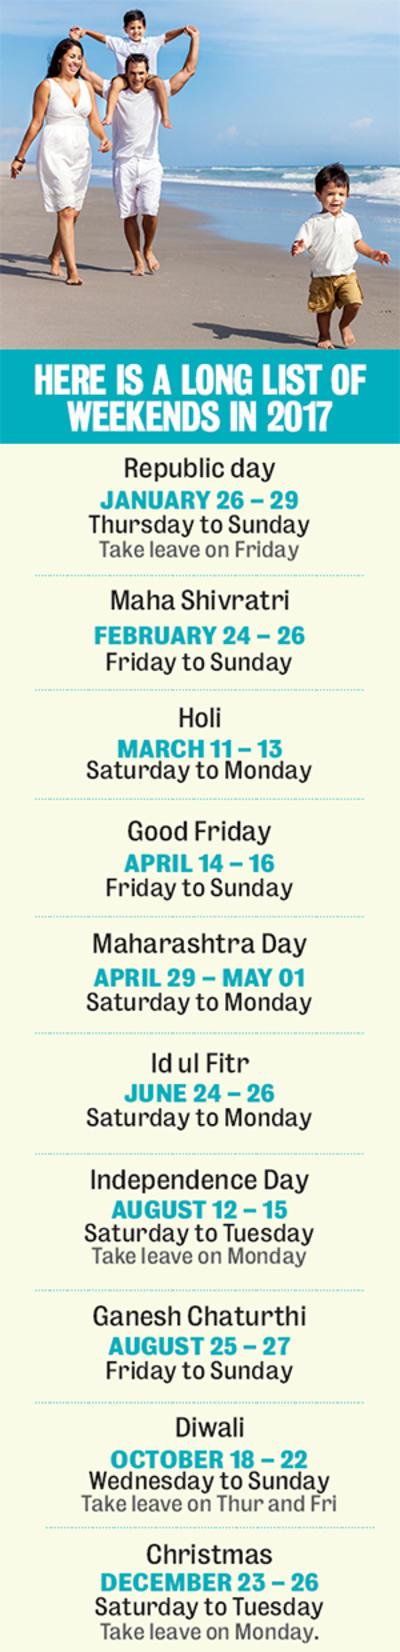 Planning the ideal weekend getaway